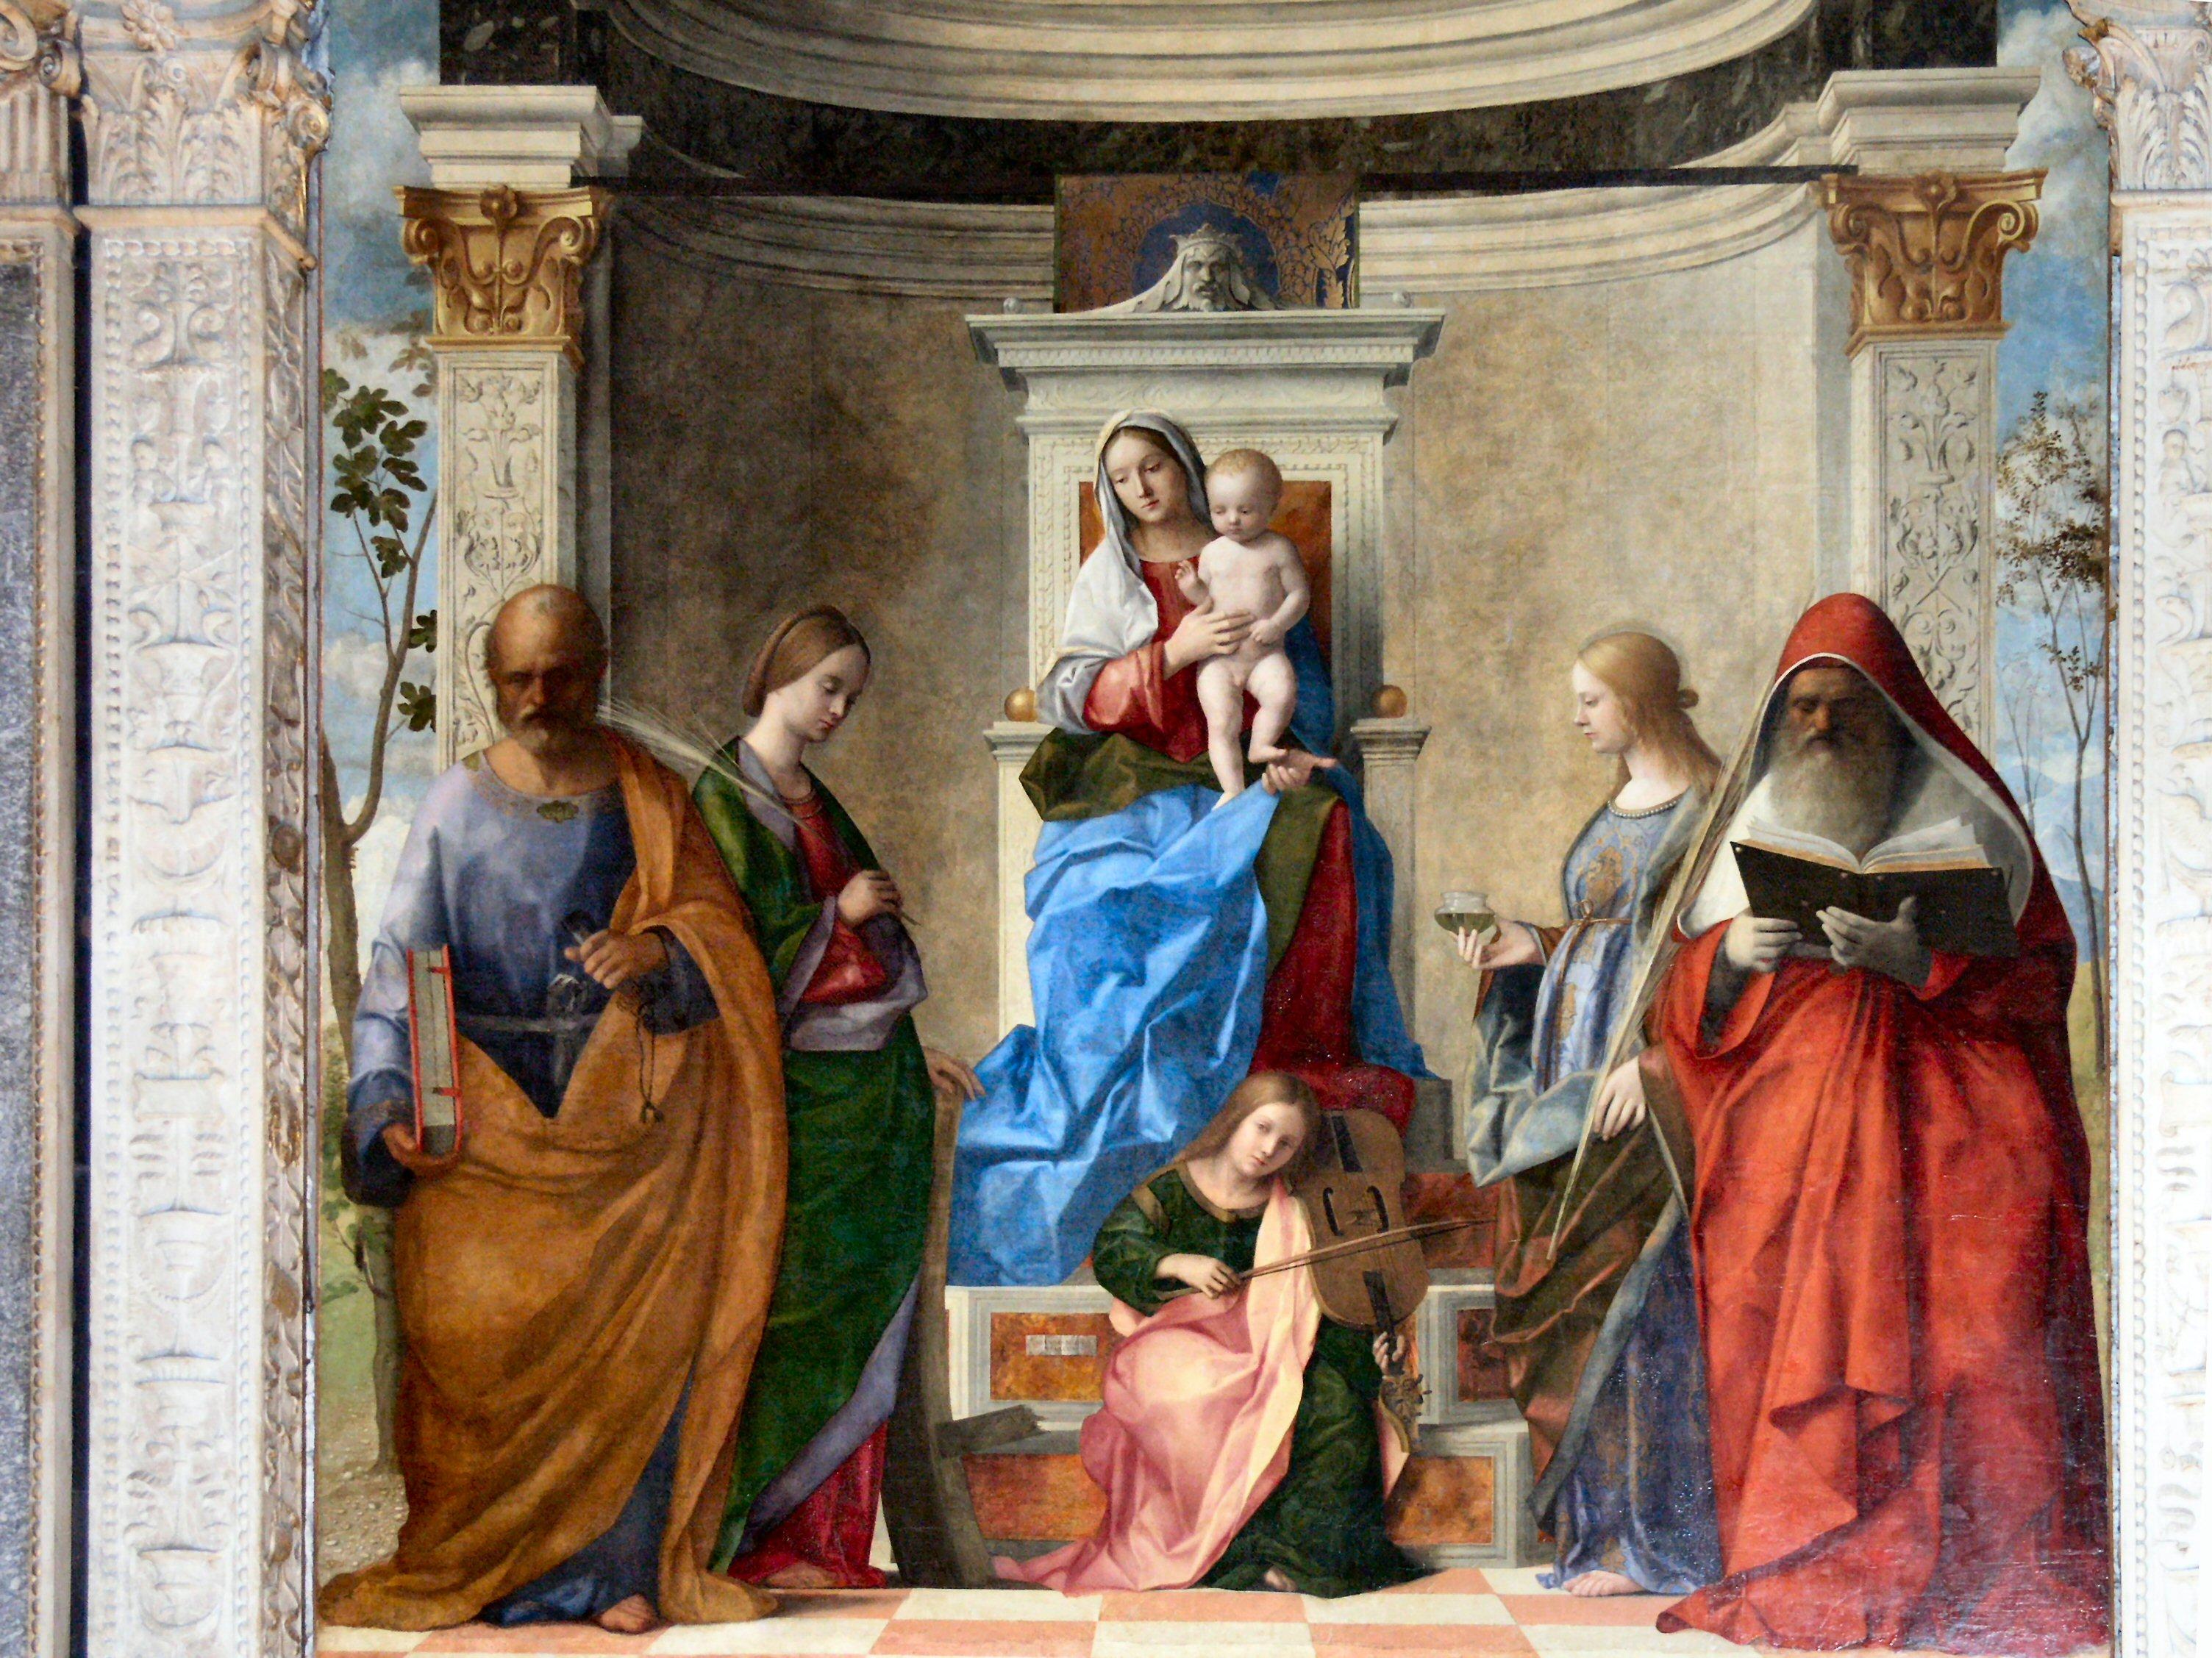 Giovanni_Bellini_Sacra_Conversatione.jpg